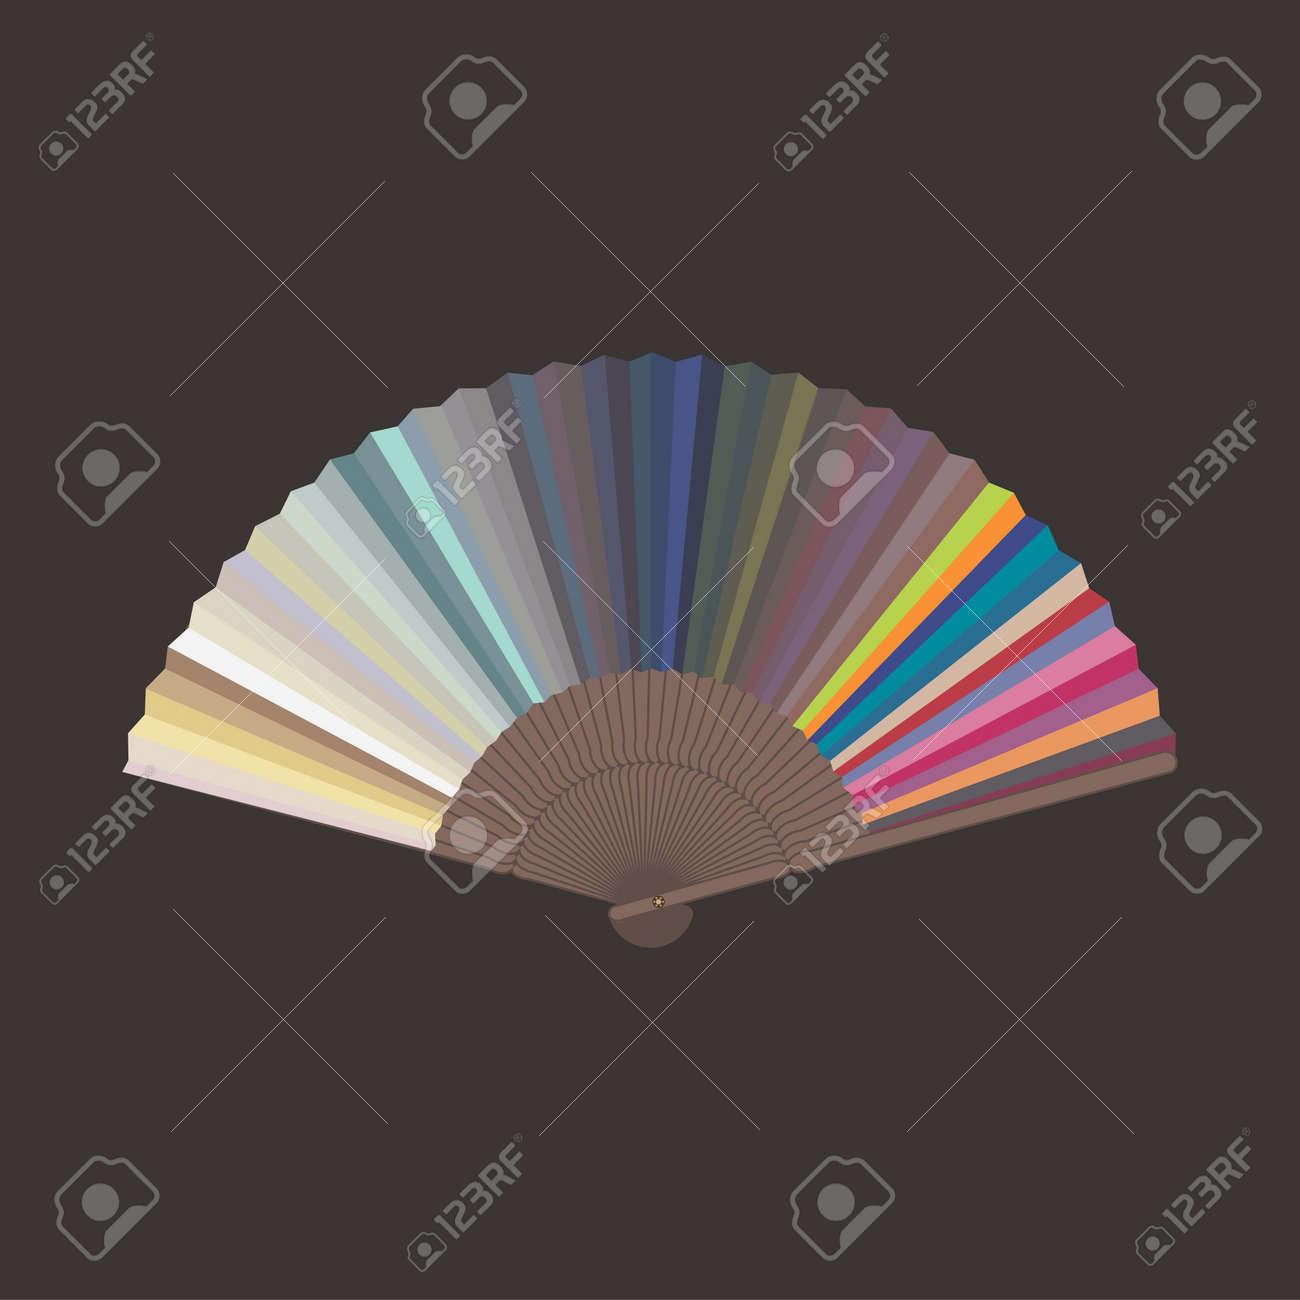 Color sampler art illustration Stock Vector - 14301591